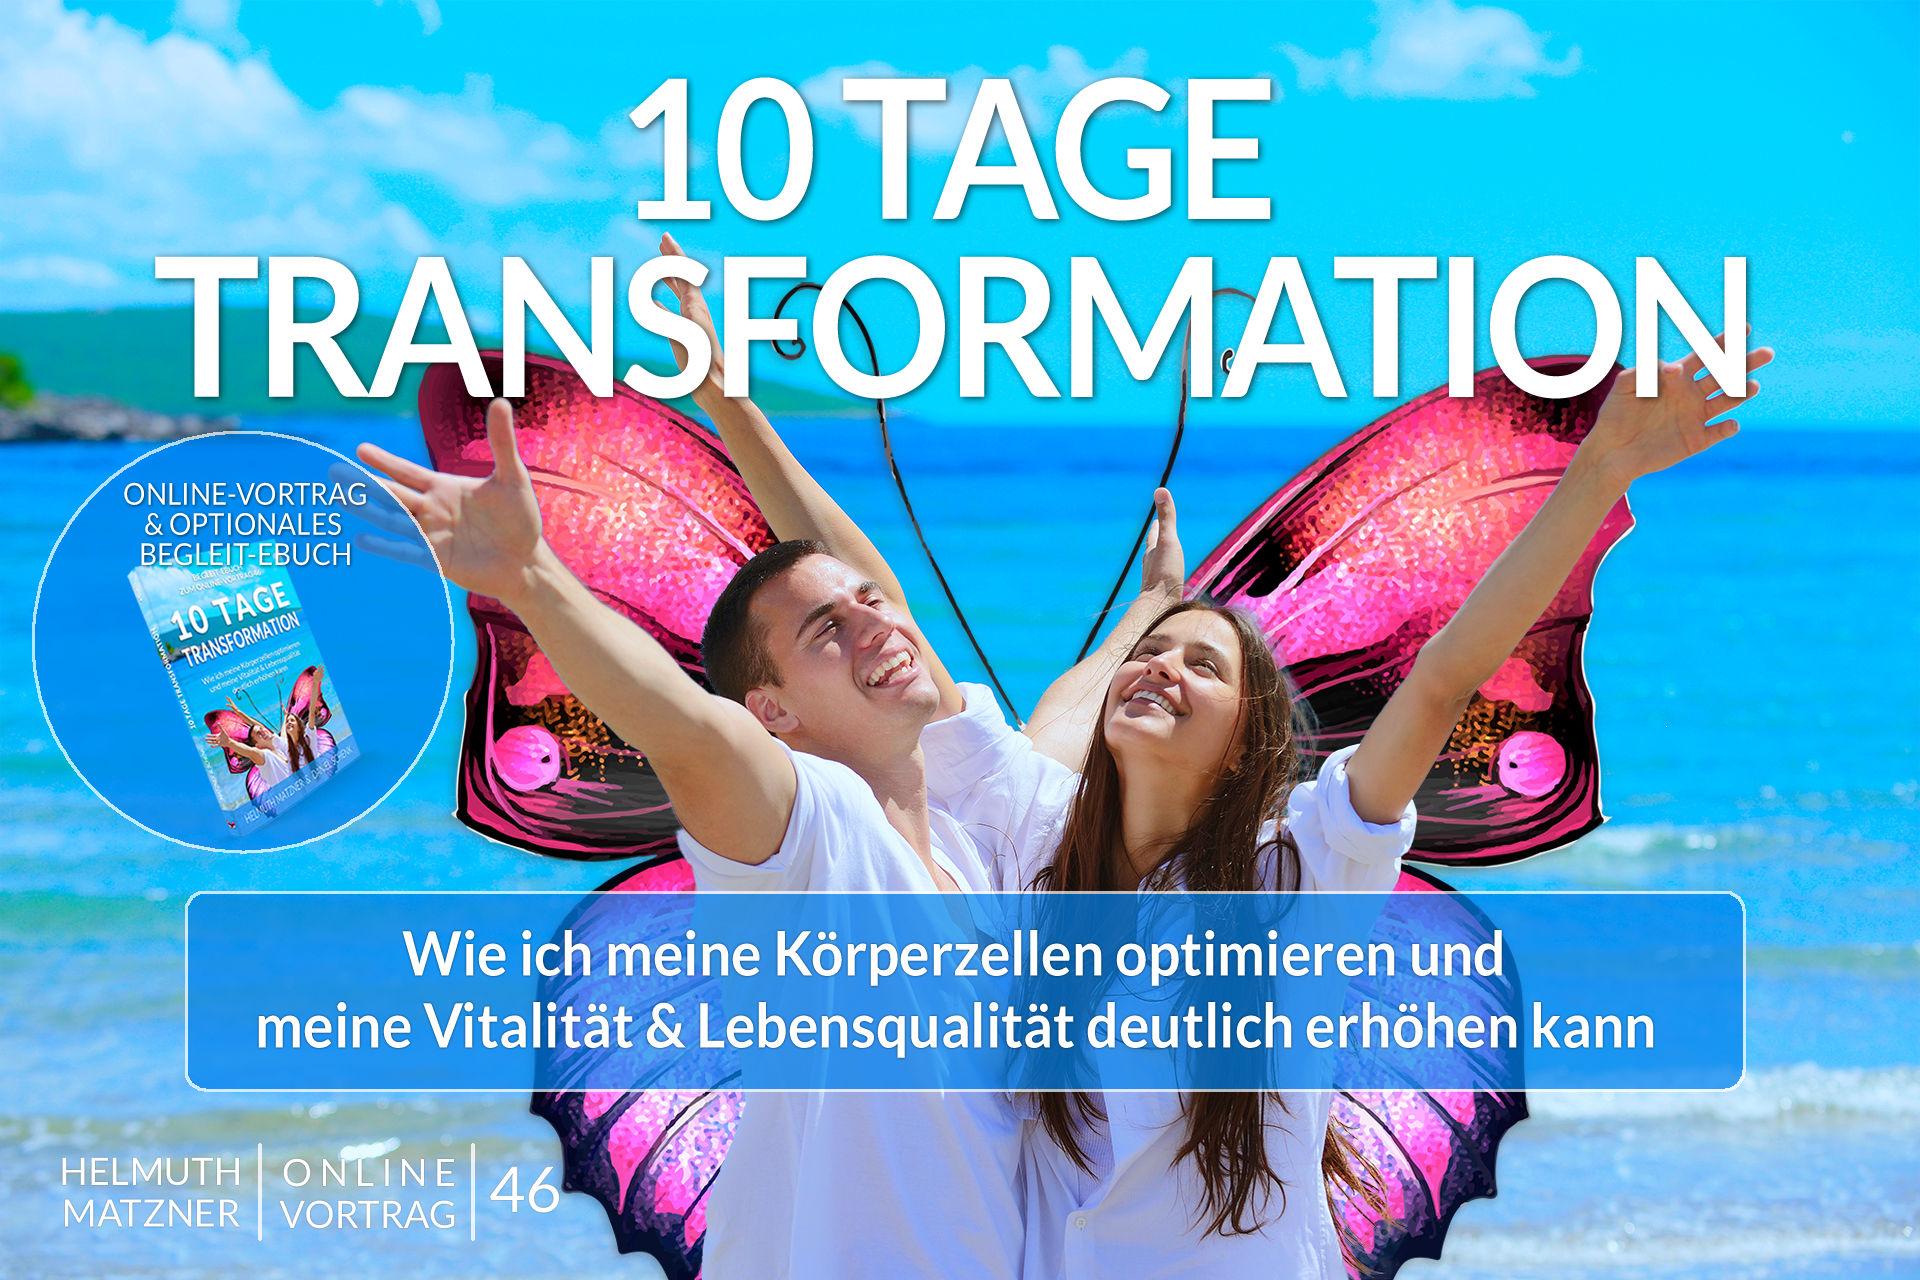 Helmuth Matzner - Online-Vortrag 46 - 10 Tage Transformation - Archiv v05B2